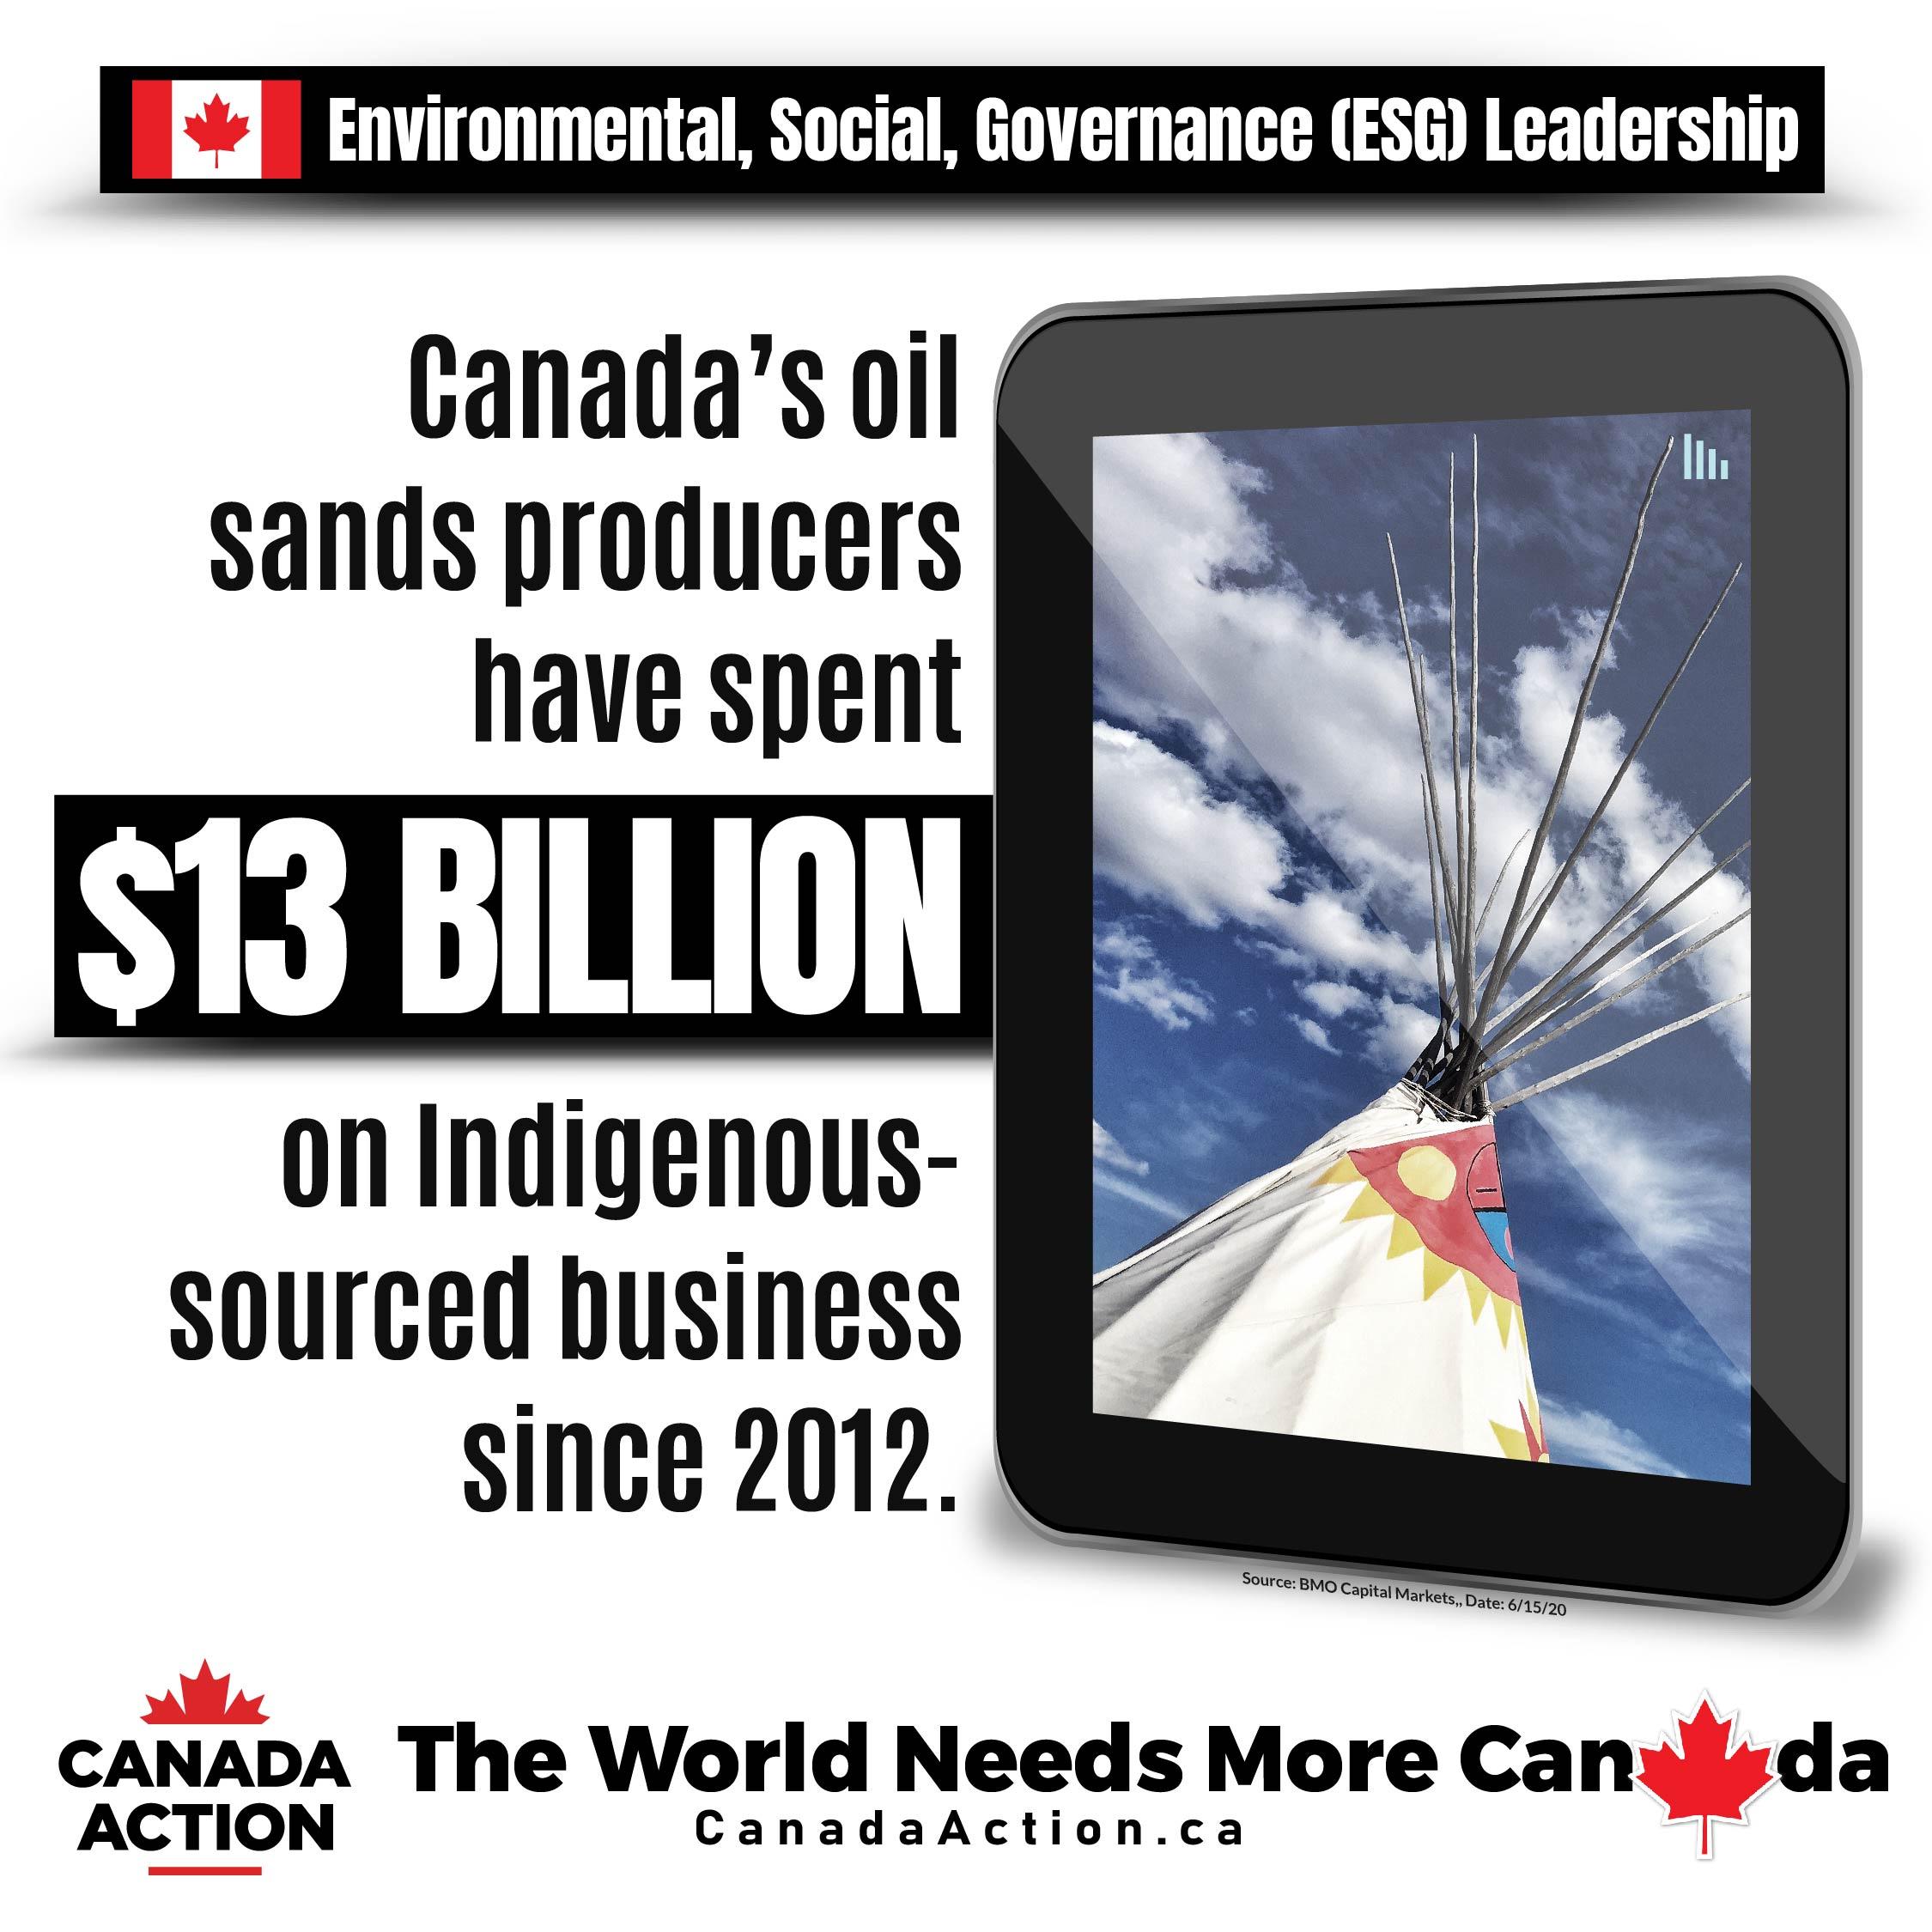 canada oil sands sector leader on social investor criteria indigenous support 13 billion since 2012